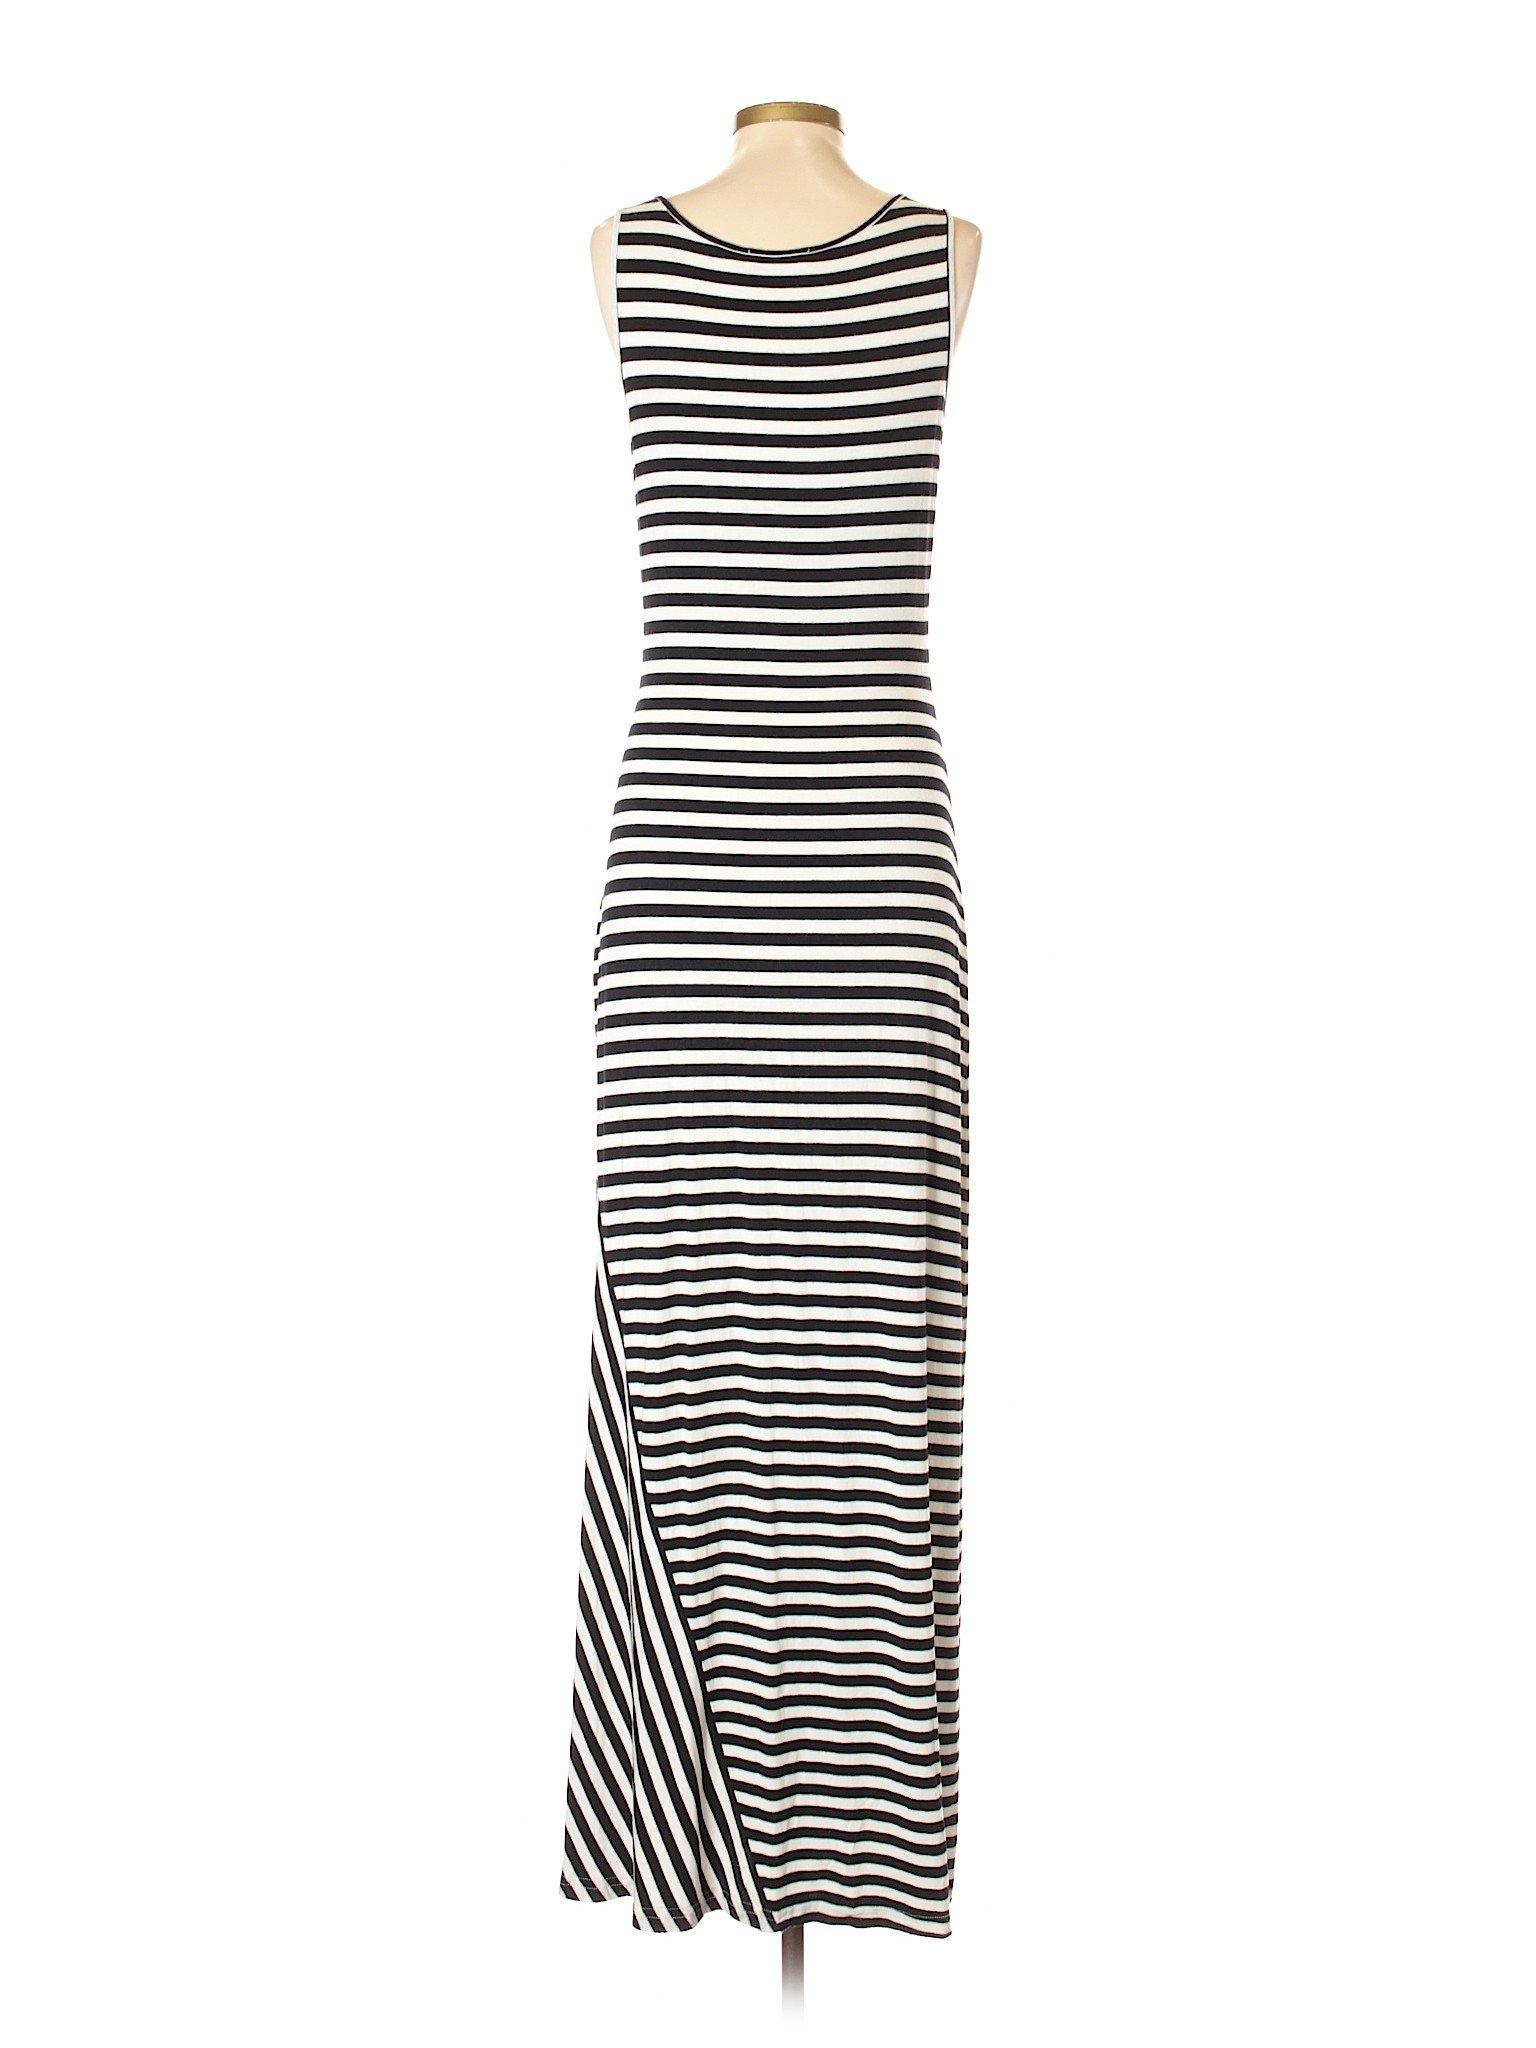 Dress Klein Winter Casual Boutique Calvin wqI8aP1a